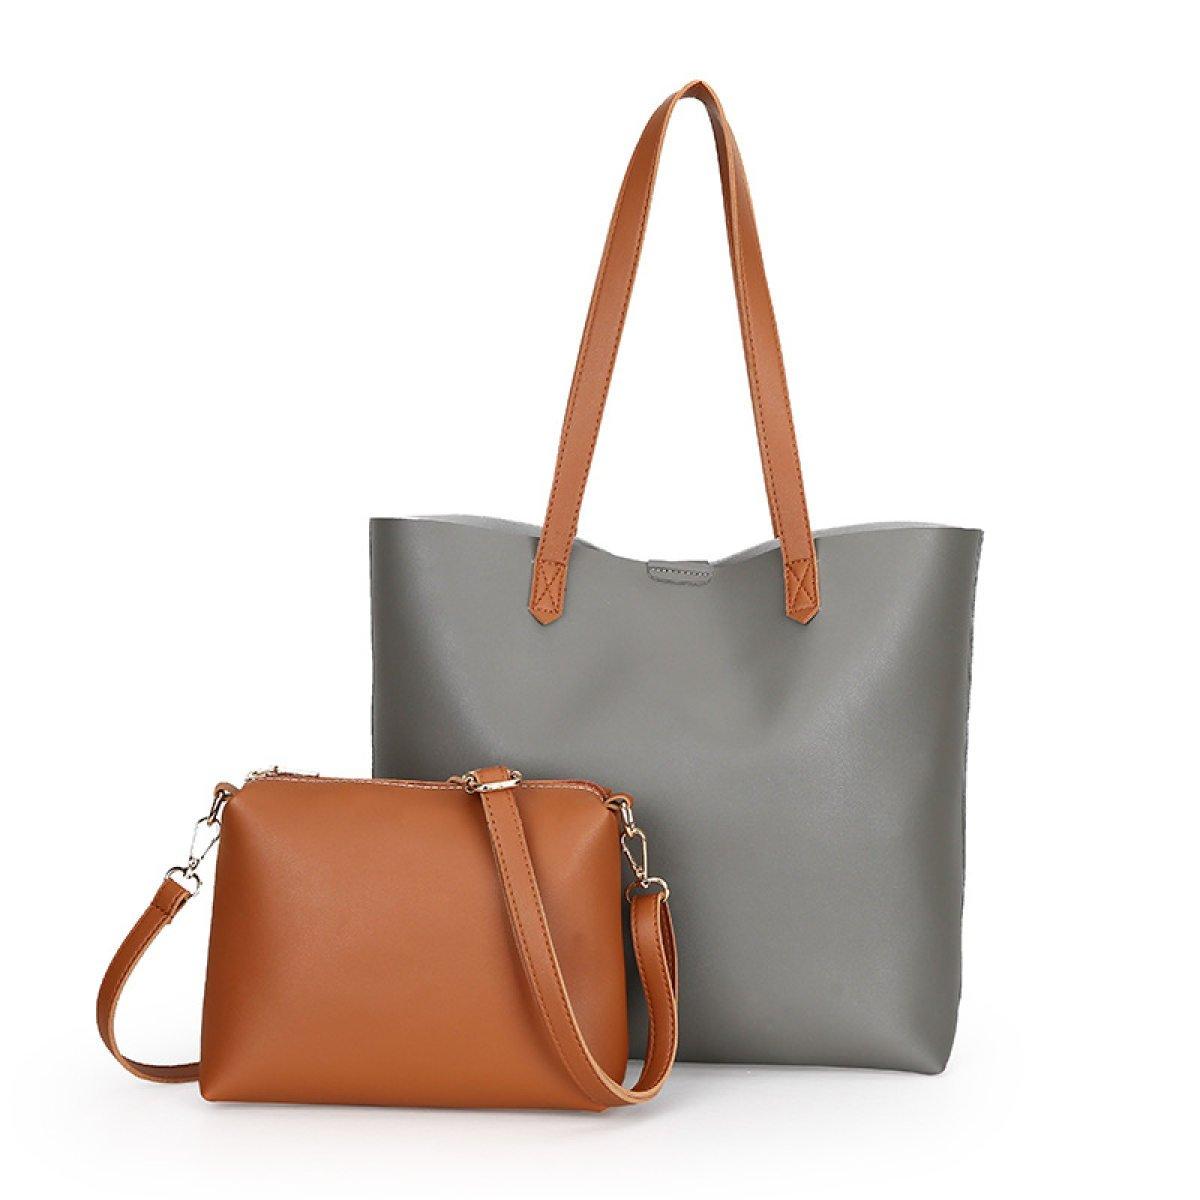 a75374a34f Fashion Women PU Leather Handbag Shoulder Bag Tote Bag Crossbody Bags  Messenger Bag Purse Bags 2 Pcs Set (4 Colors)